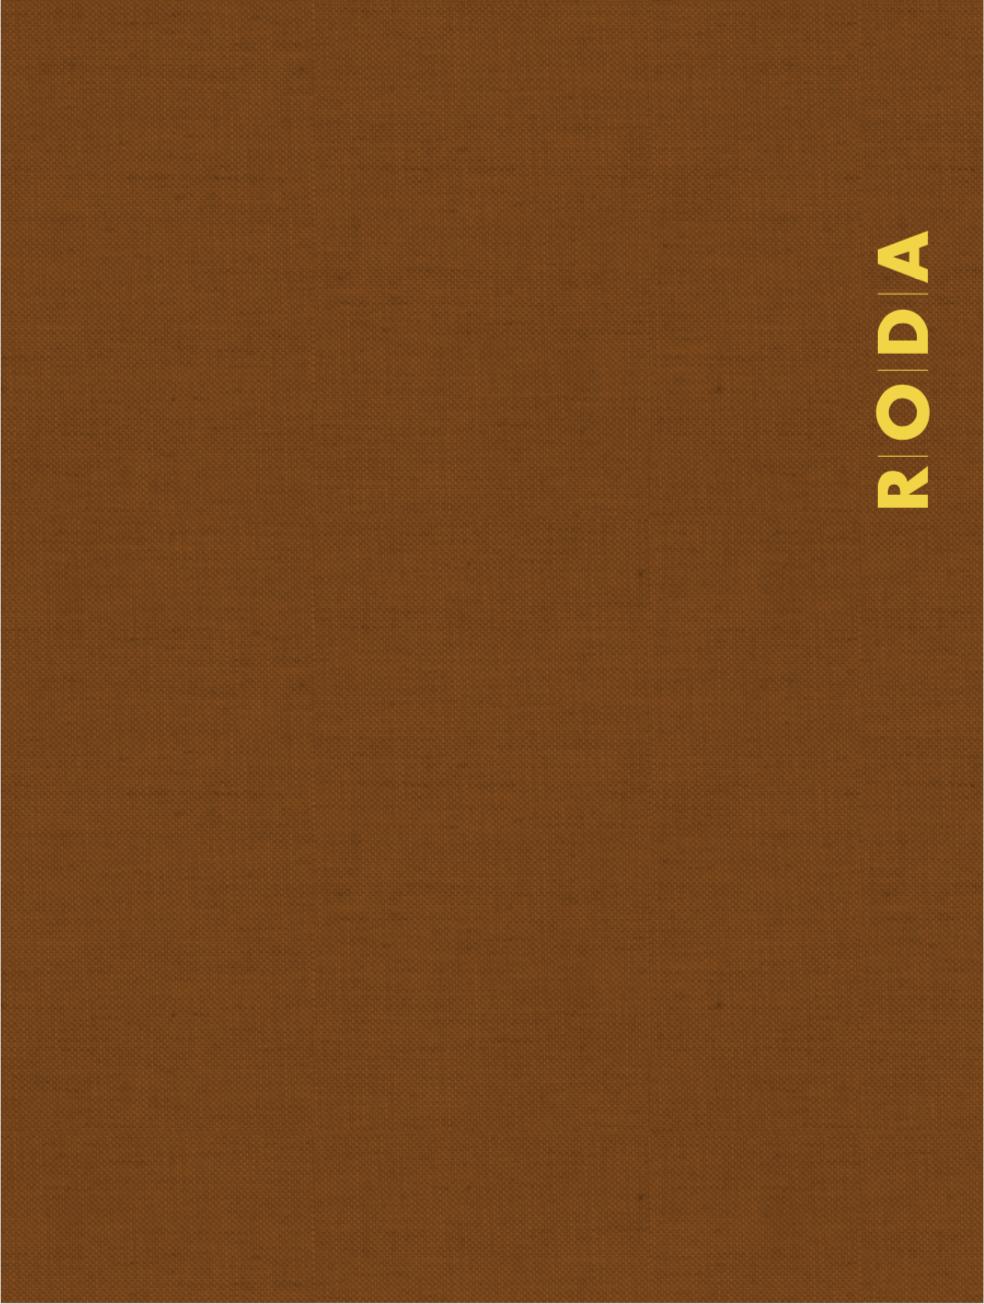 RODA_19:20